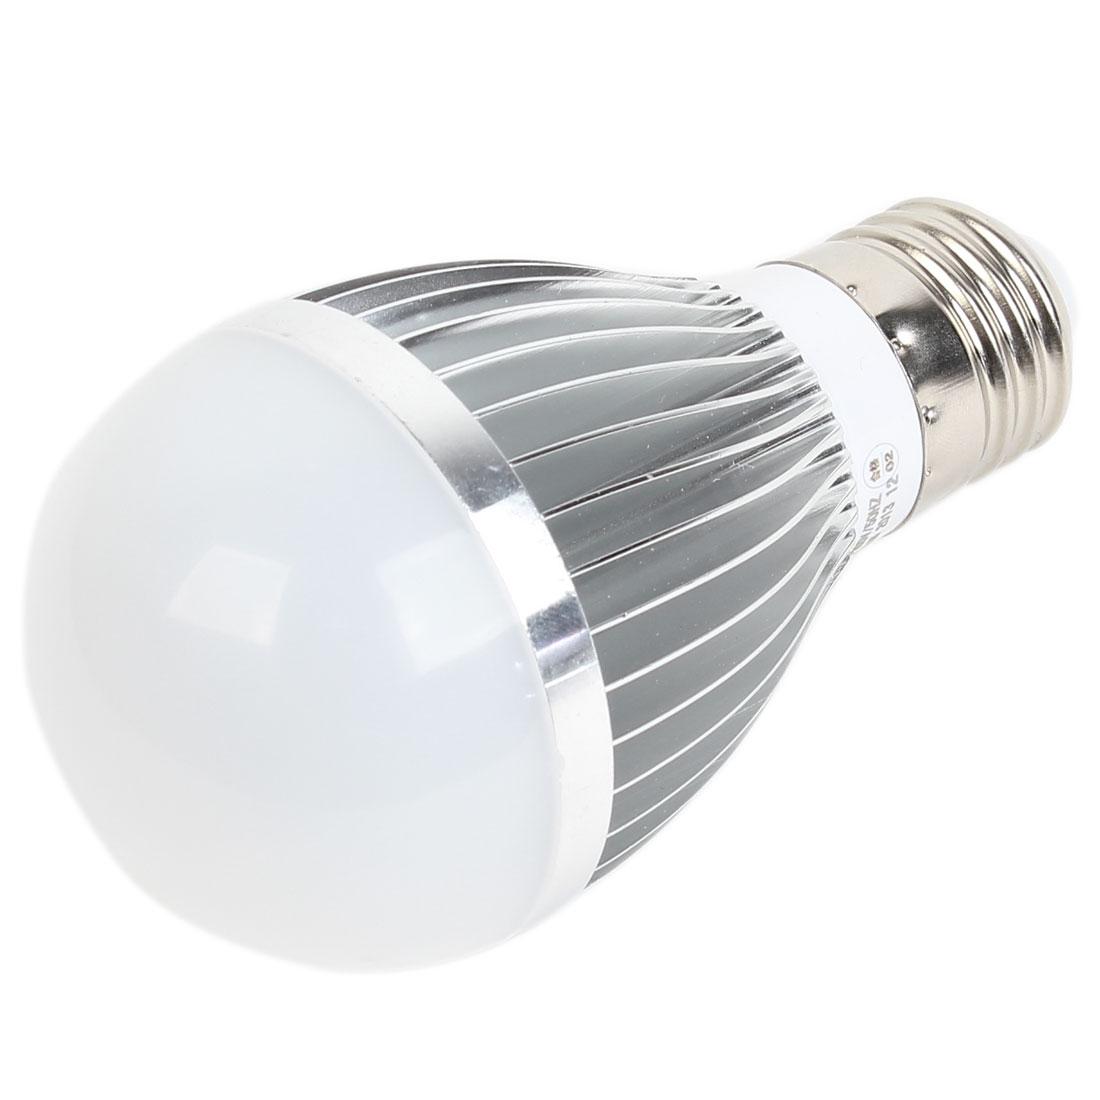 Home E27 Energy Saving LED Globe Ball White Light Lamp Bulb AC 165-265V 5W